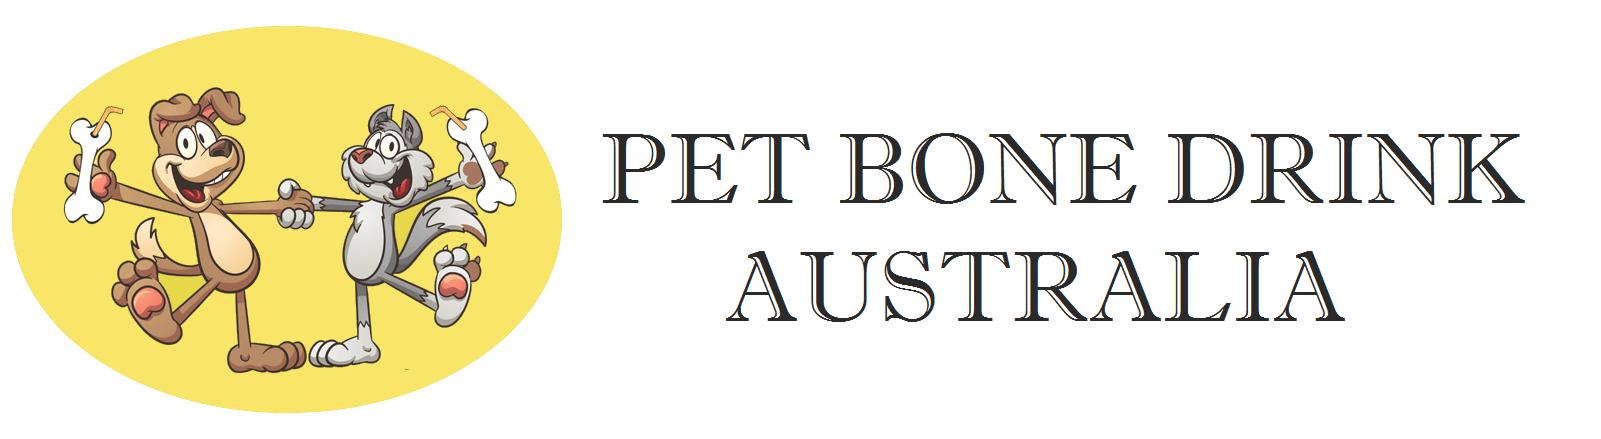 PetboneDrink